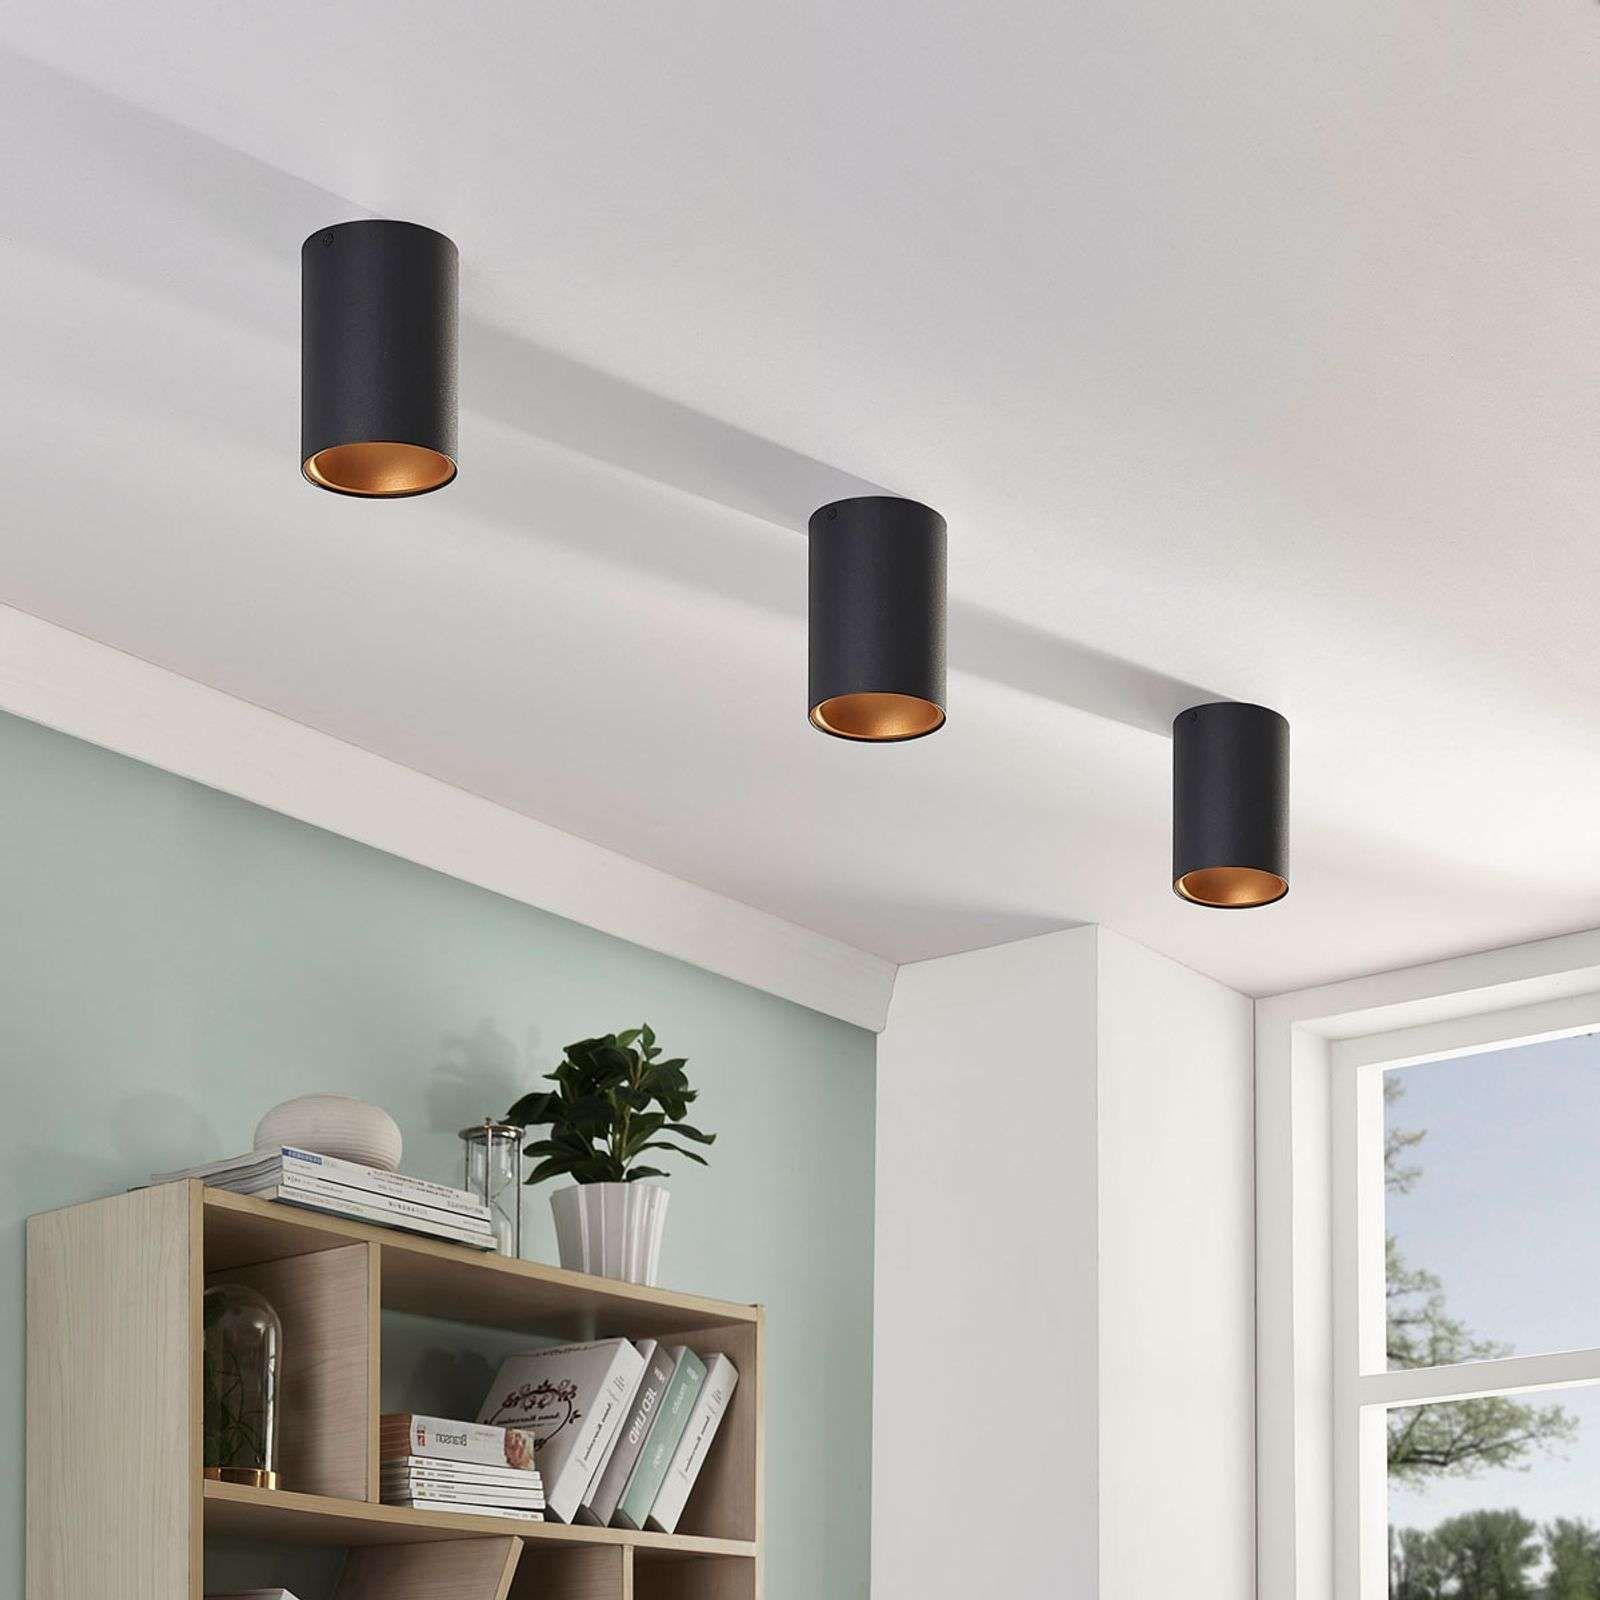 Plafonnier Vinja Halogene A Reflecteur Interne En 2020 Plafonnier Lampe De Plafond Luminaire Plafonnier